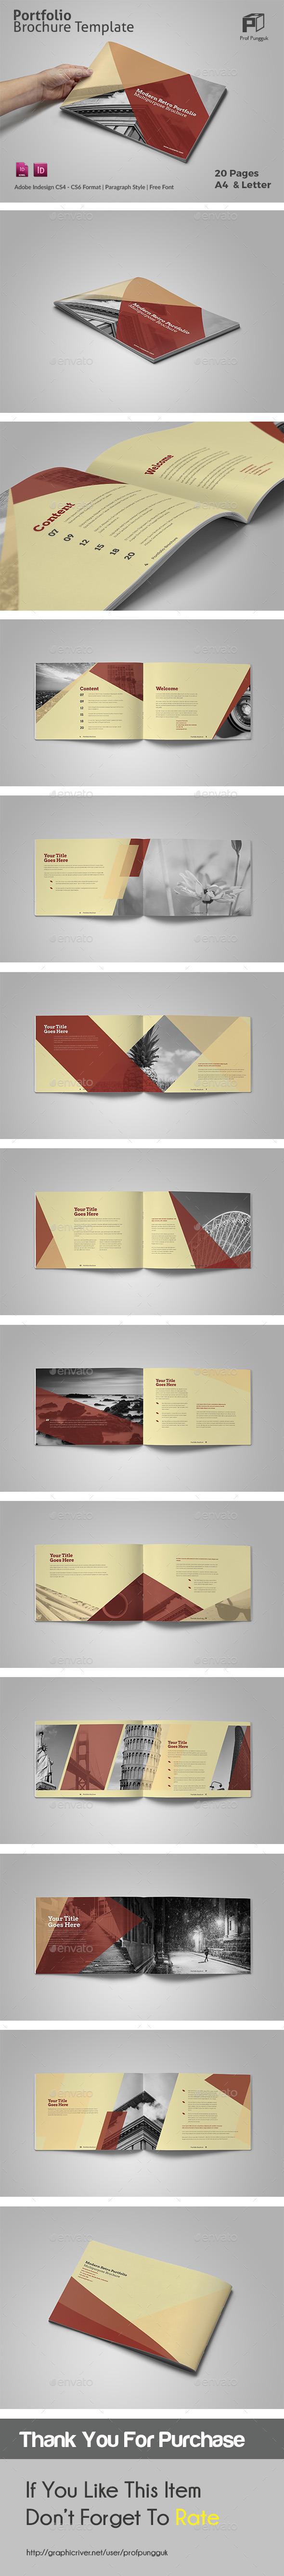 Modern Retro Brochure - Portfolio Brochures